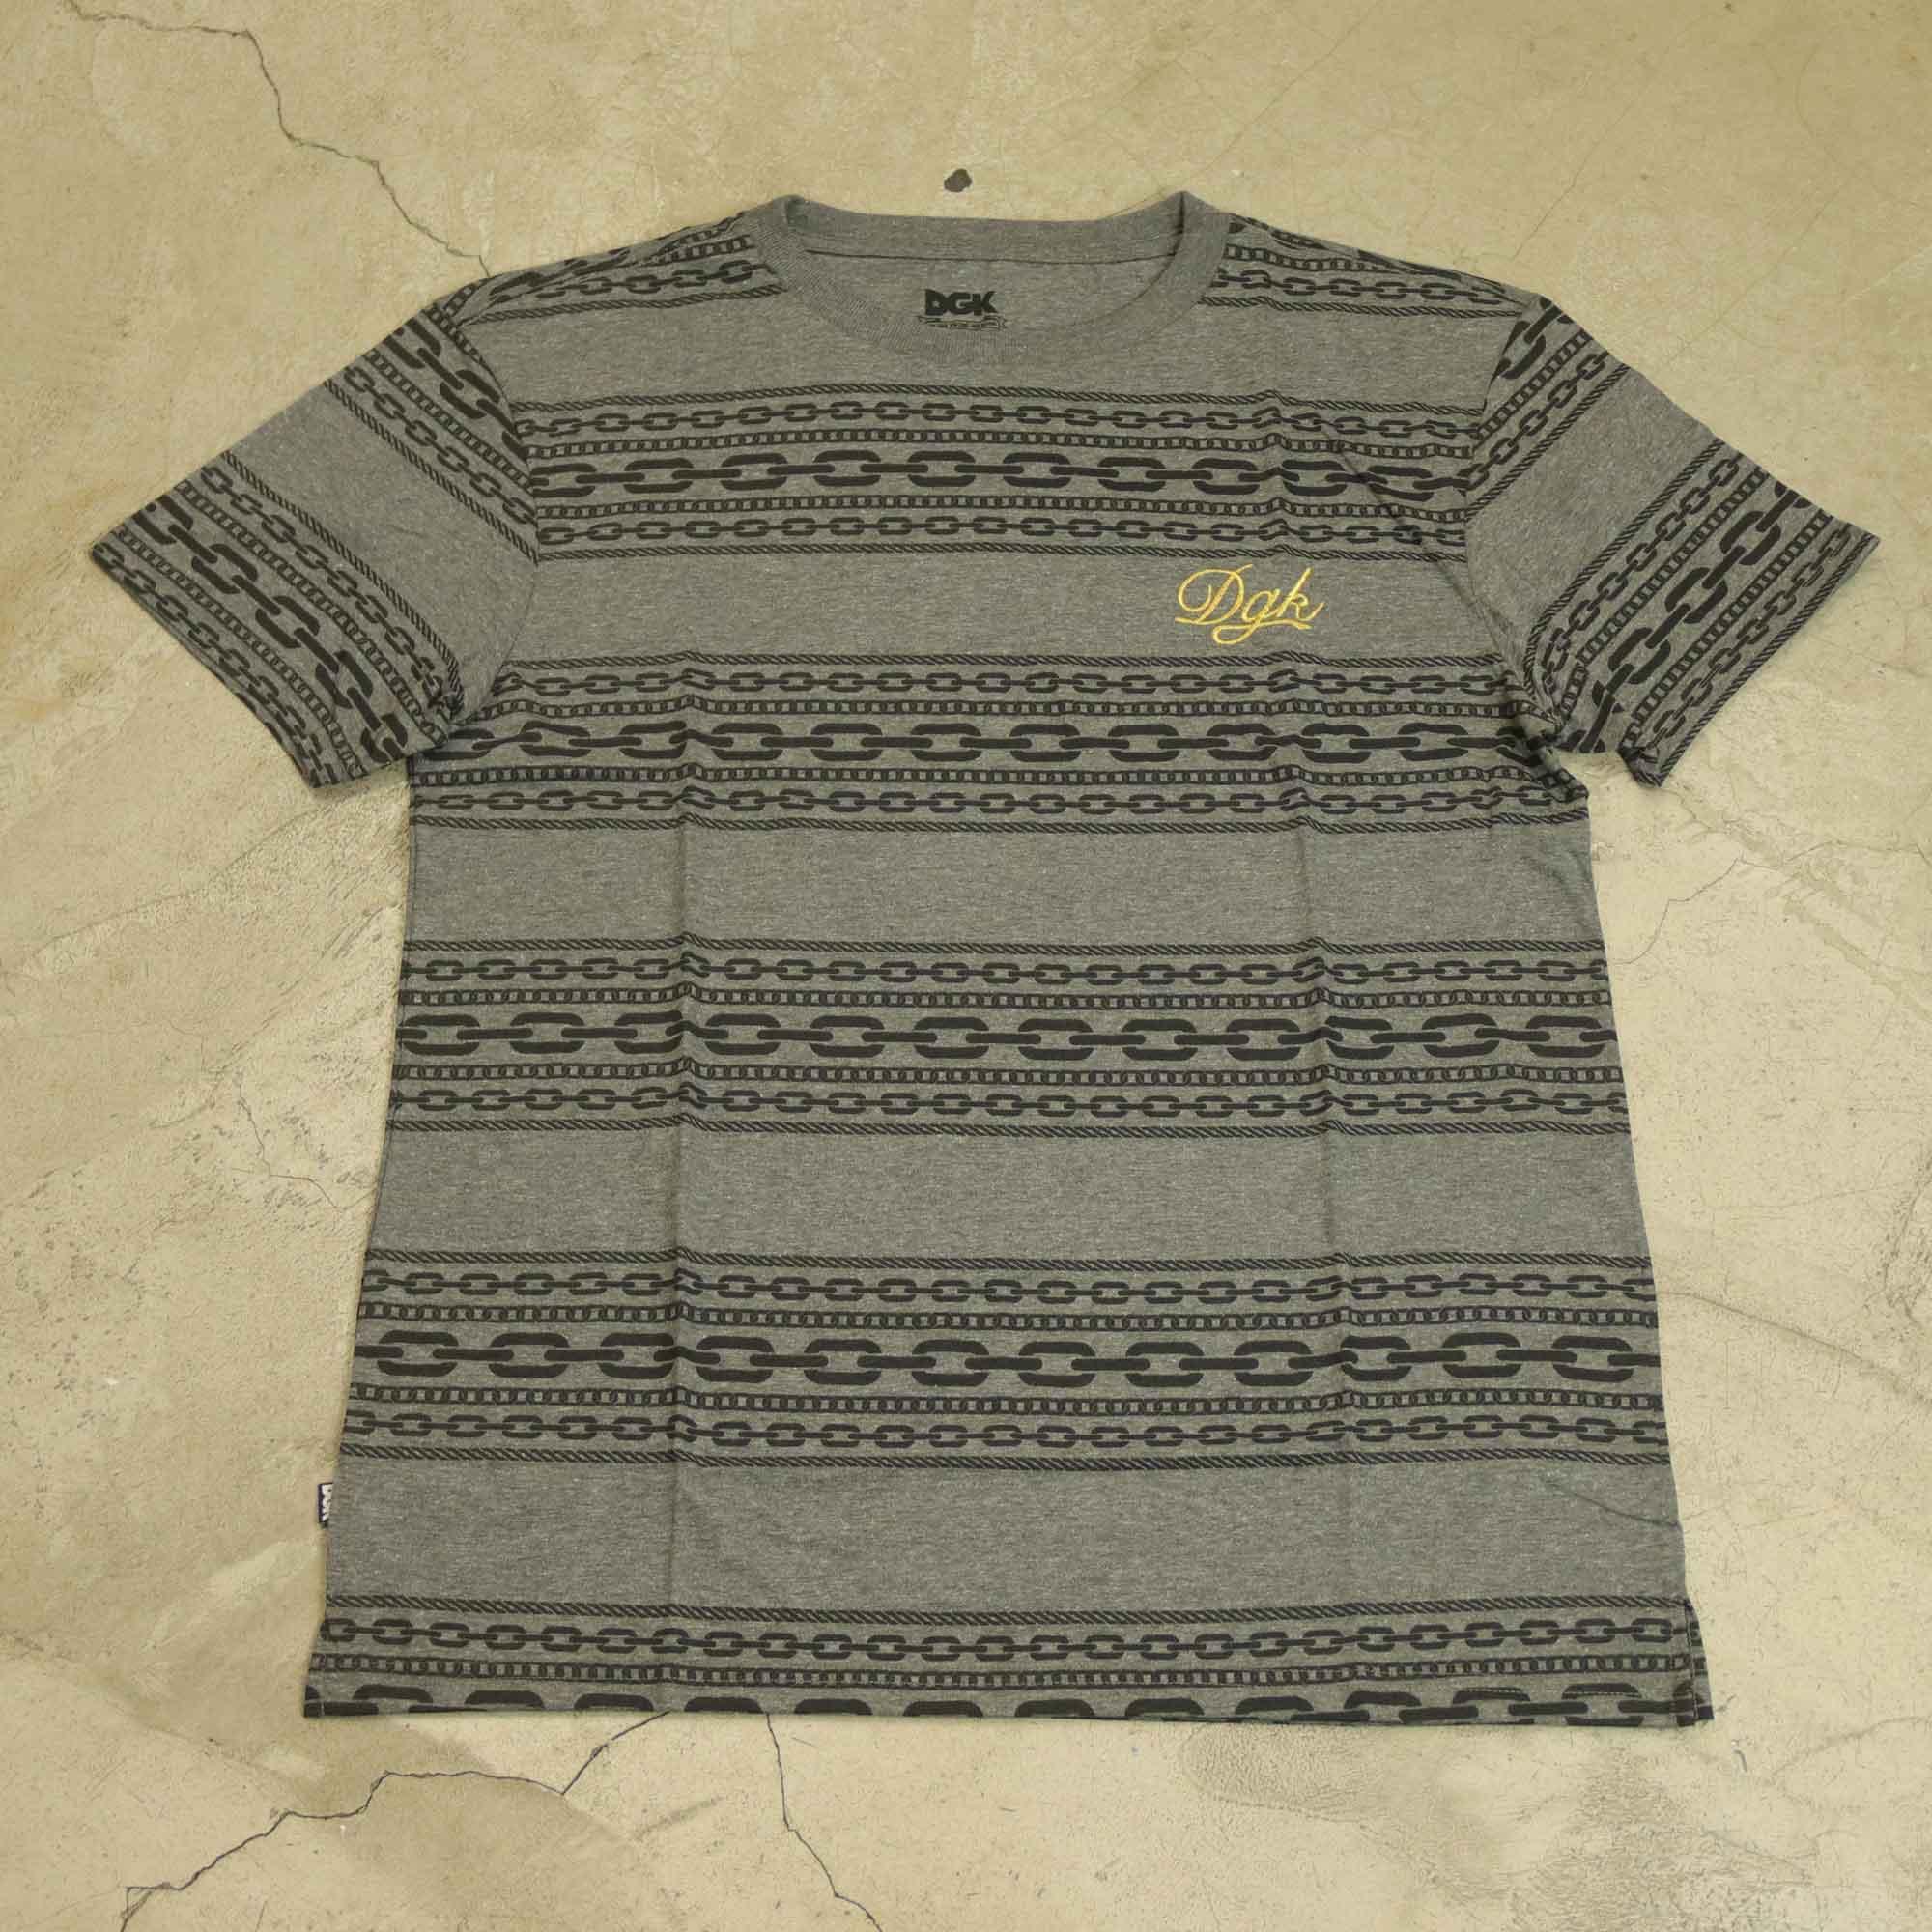 Camiseta DGK